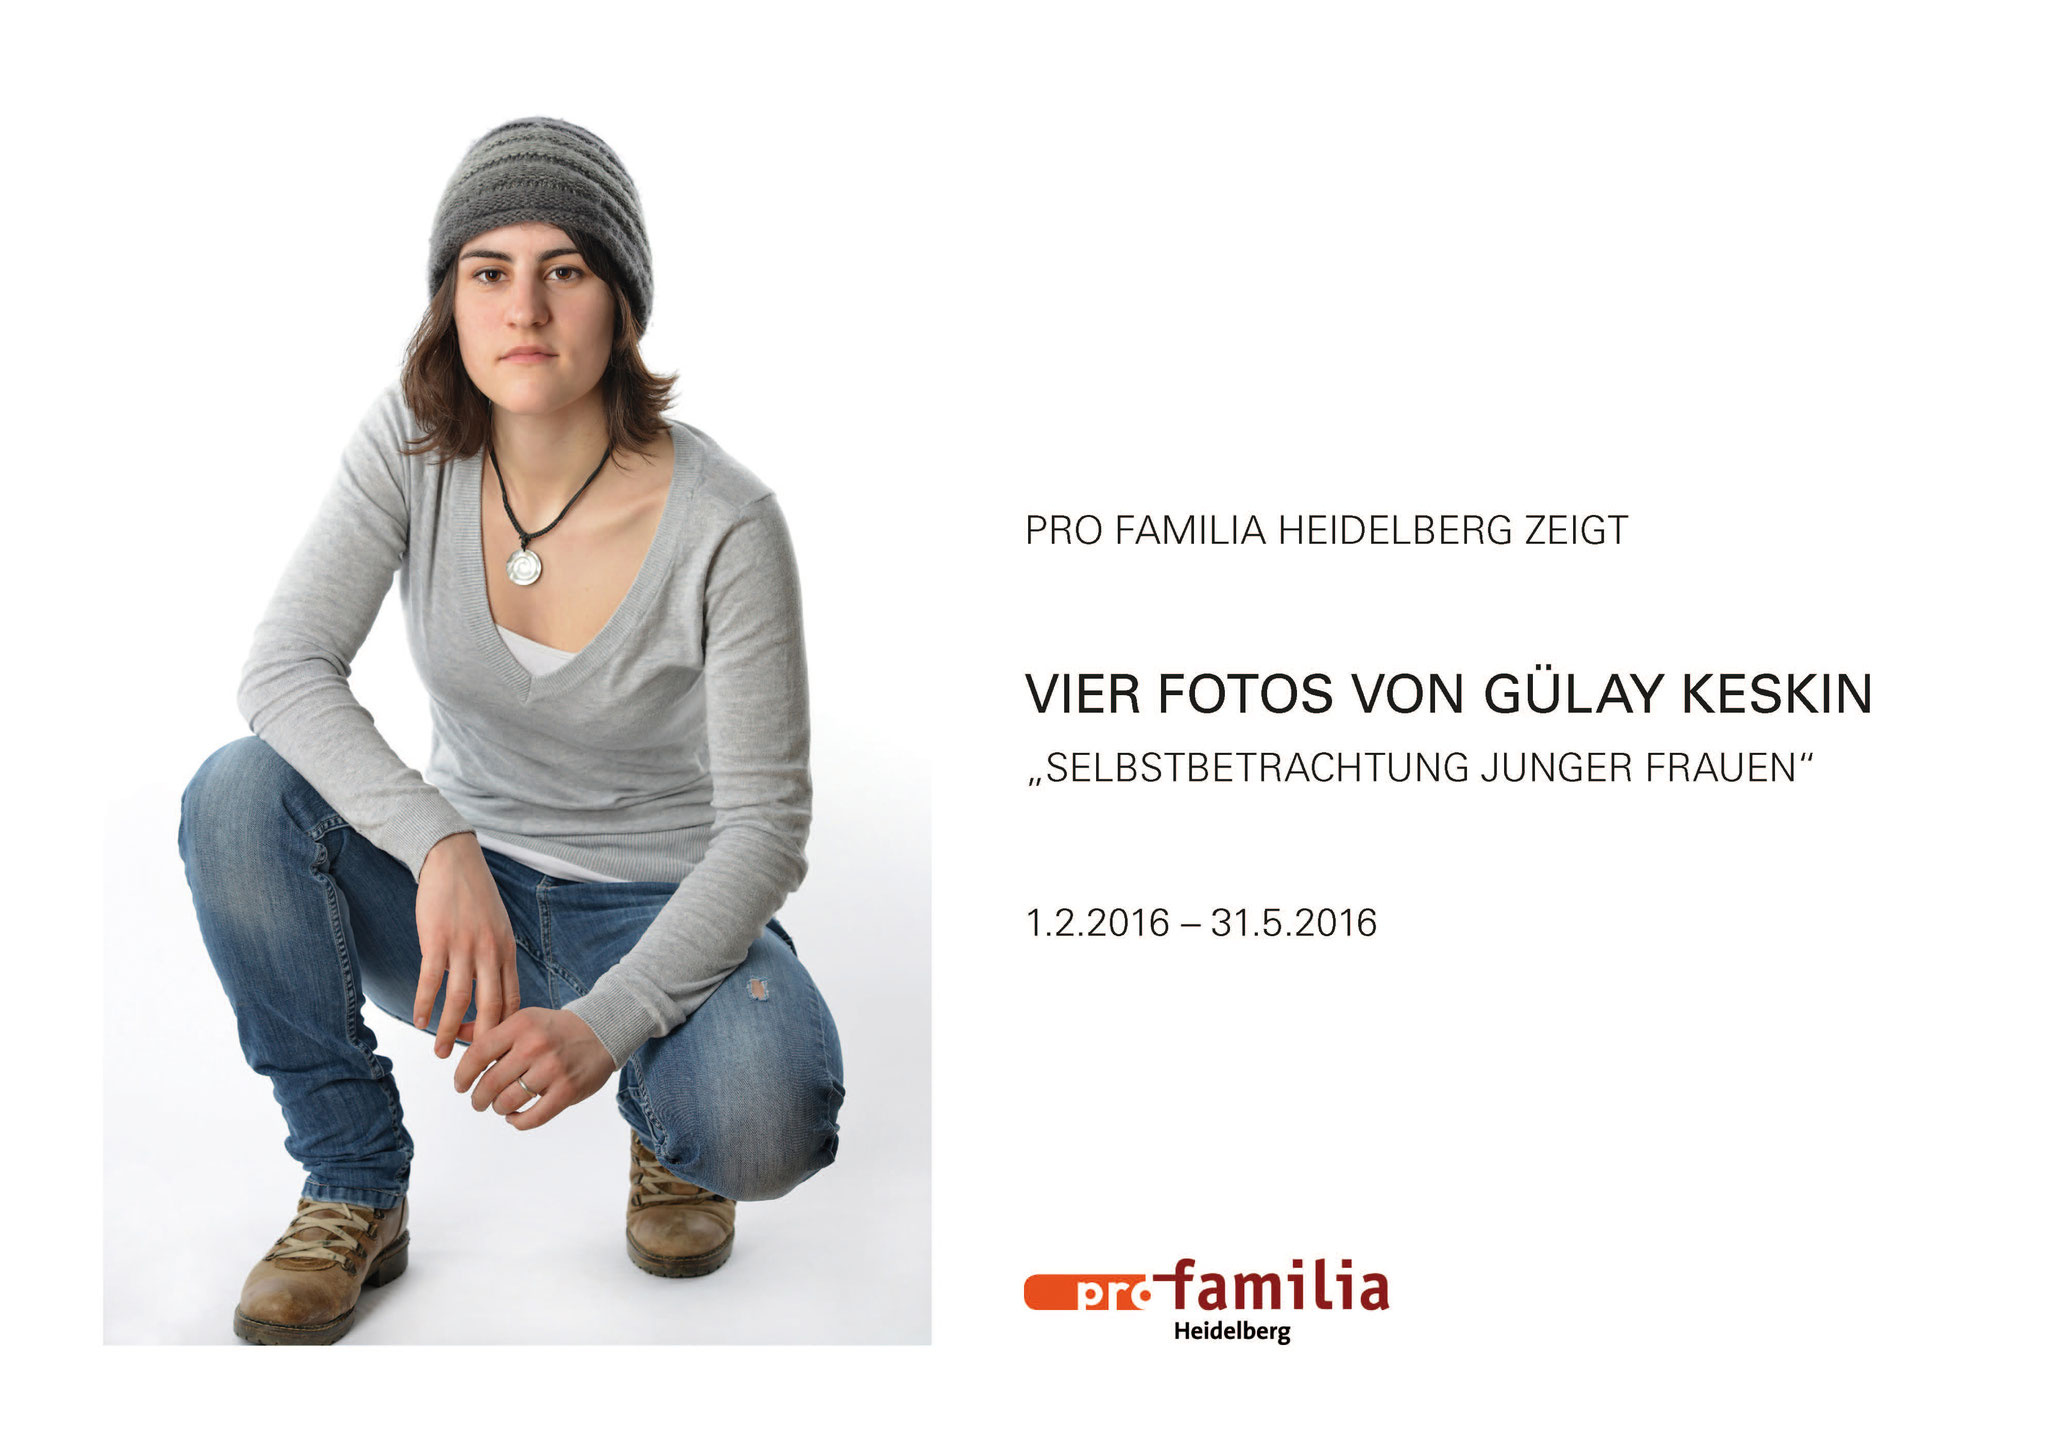 Selbstbetrachtung junger Frauen, Heidelberg 2016